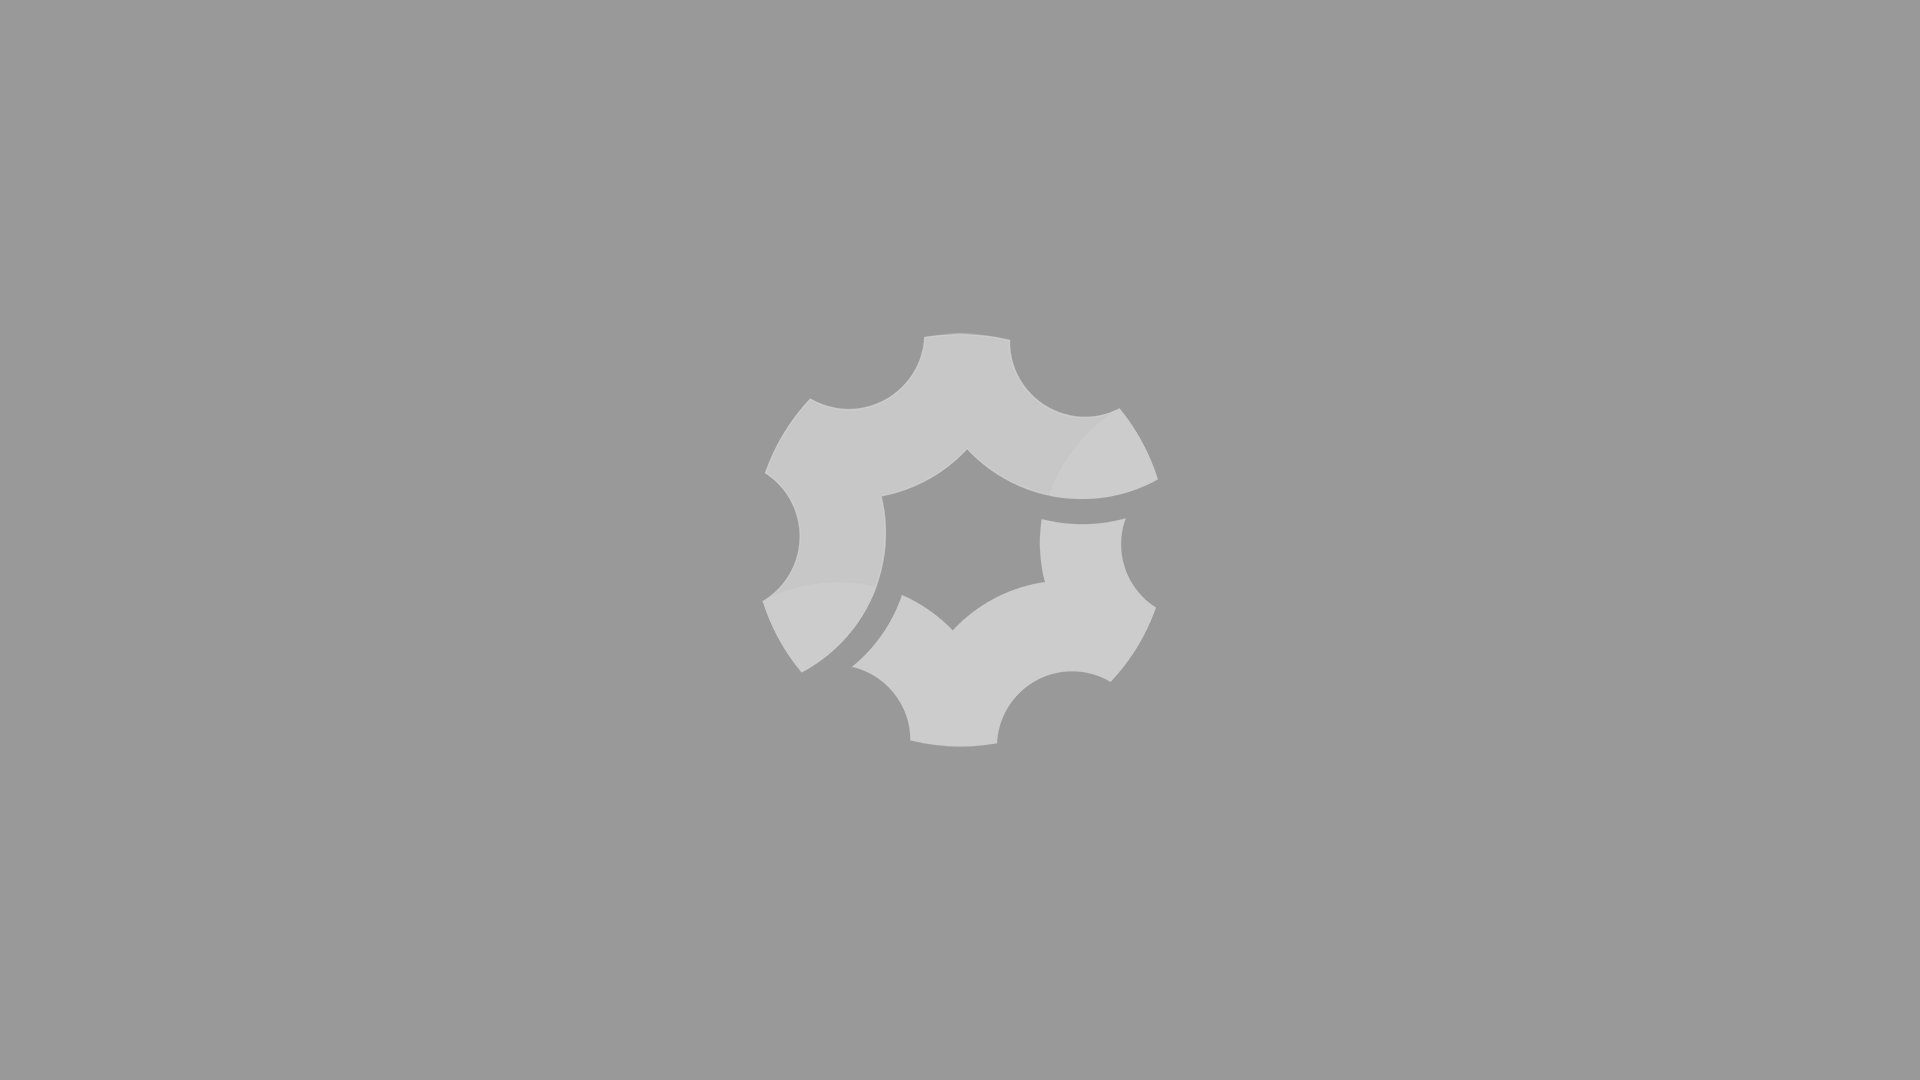 desktop_screenshot_2020.11.26_-_14.49.00.32.png